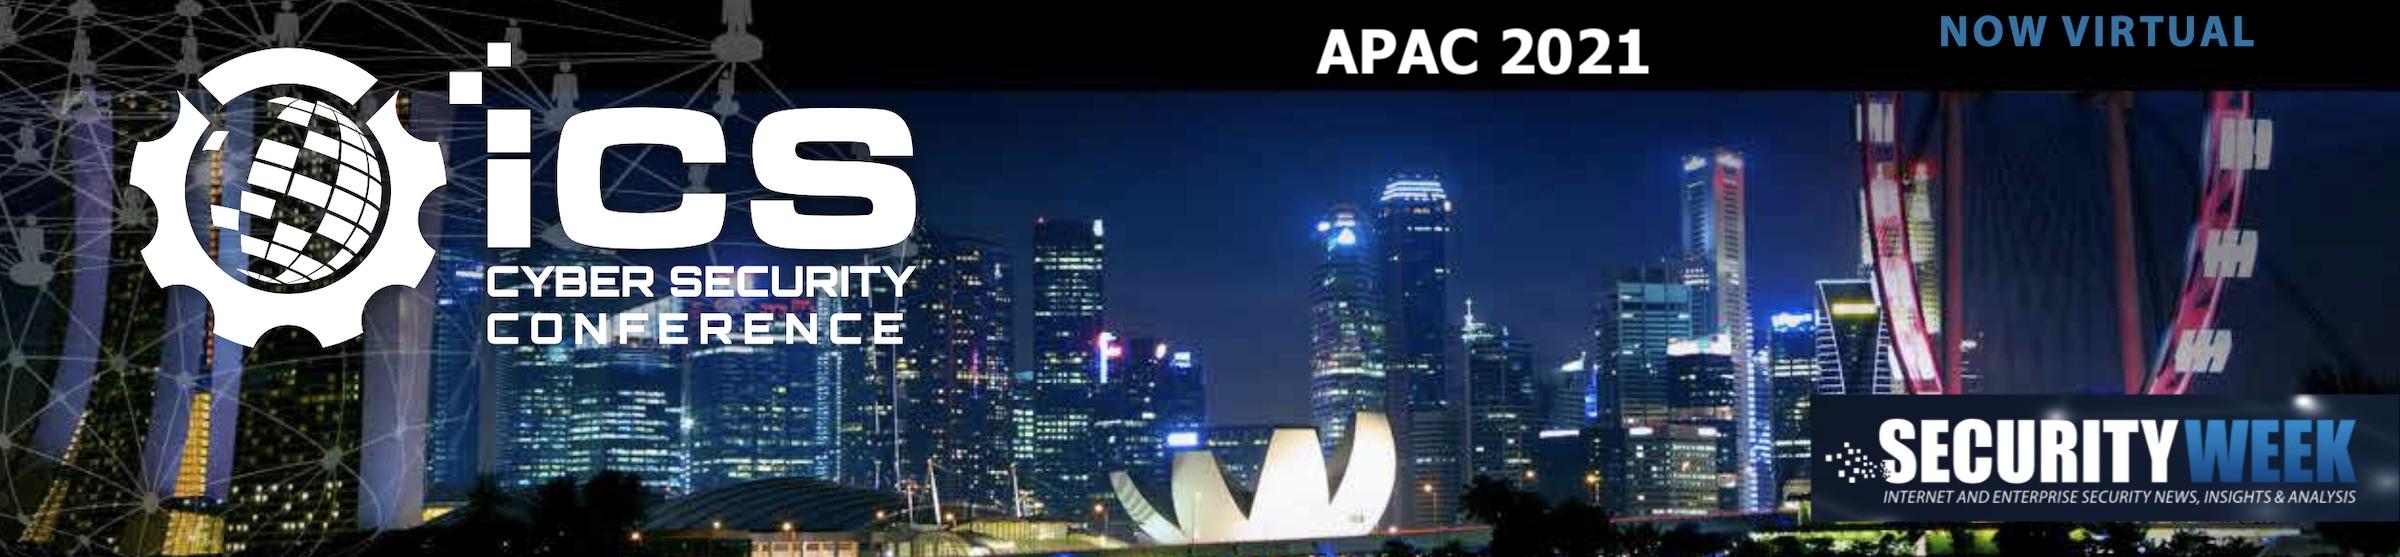 APAC_ICS_Cyber-Conference